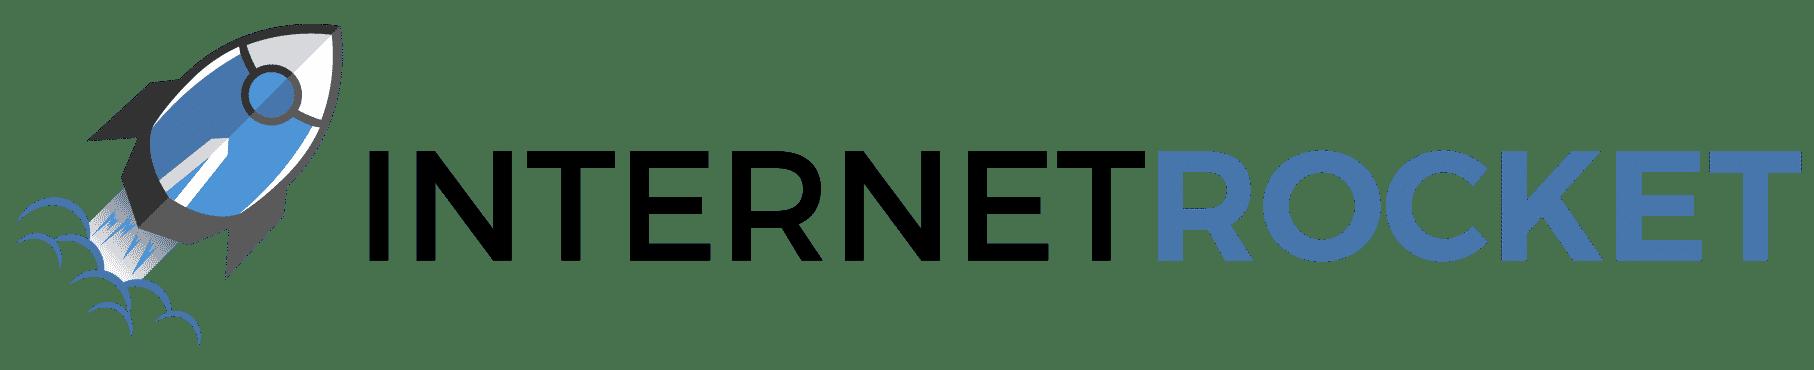 InternetRocket